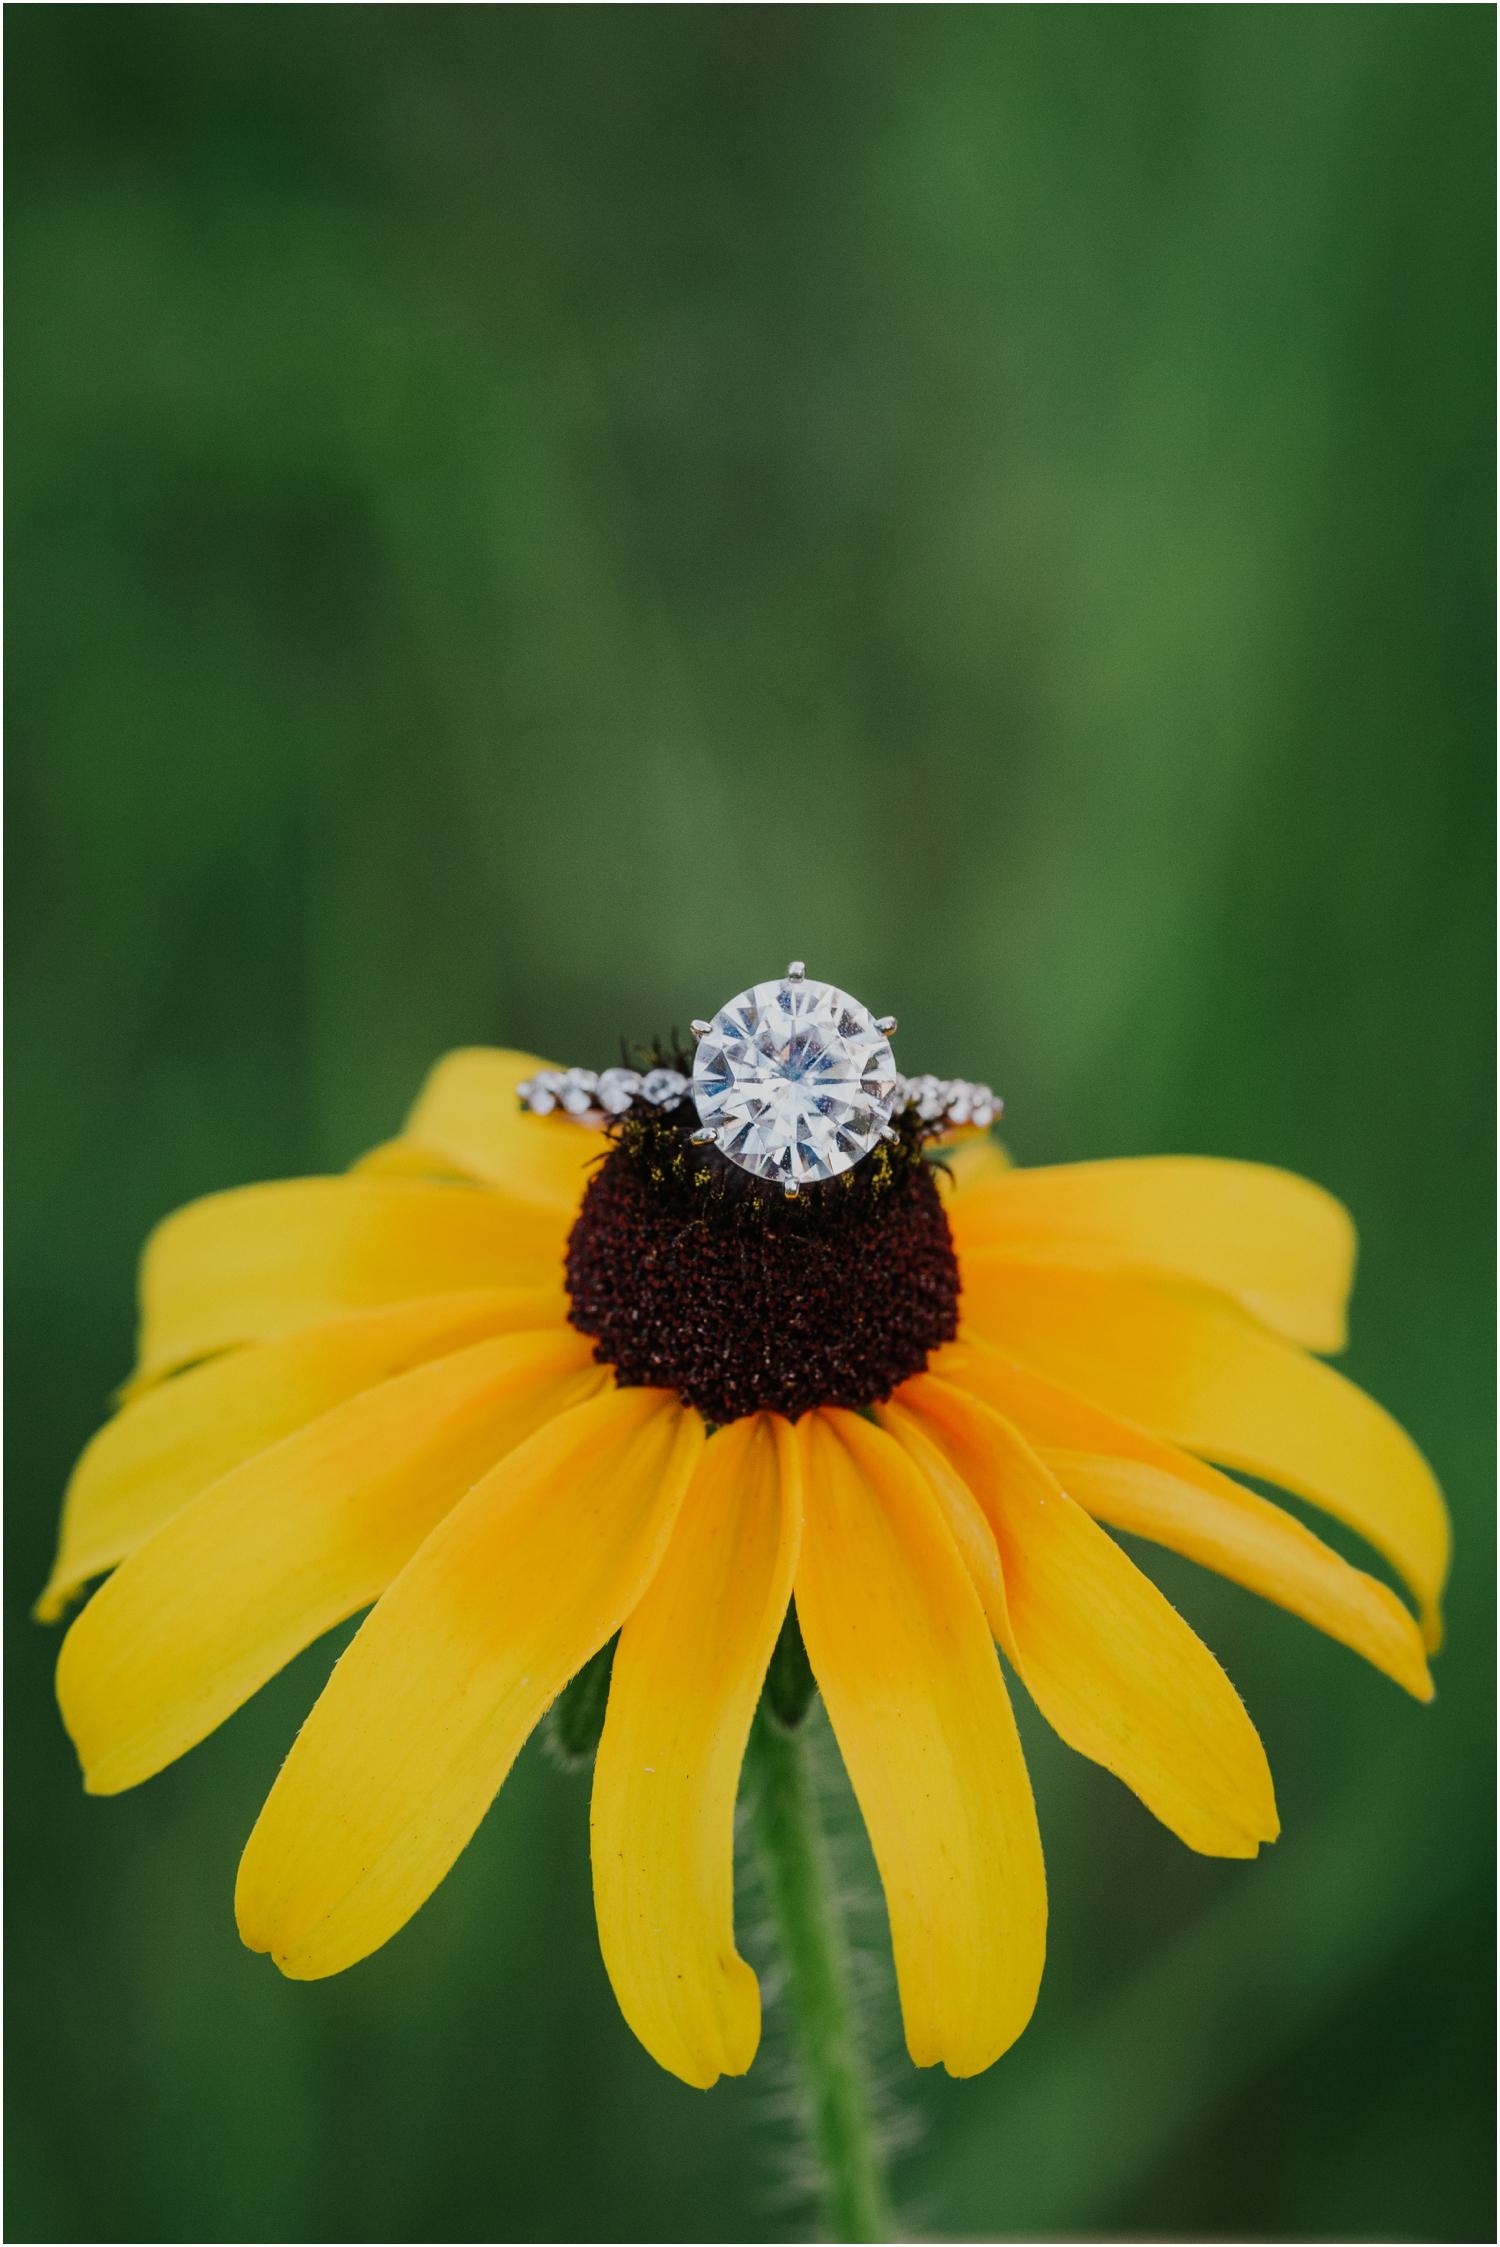 katy-sergent-photography-watauga-lake-engagement-session-northeast-tennessee-wedding-intimate-elopement-engagement-photographer-johnson-city-butler-adventurous-couples-adventure-explore-outdoors_0028.jpg